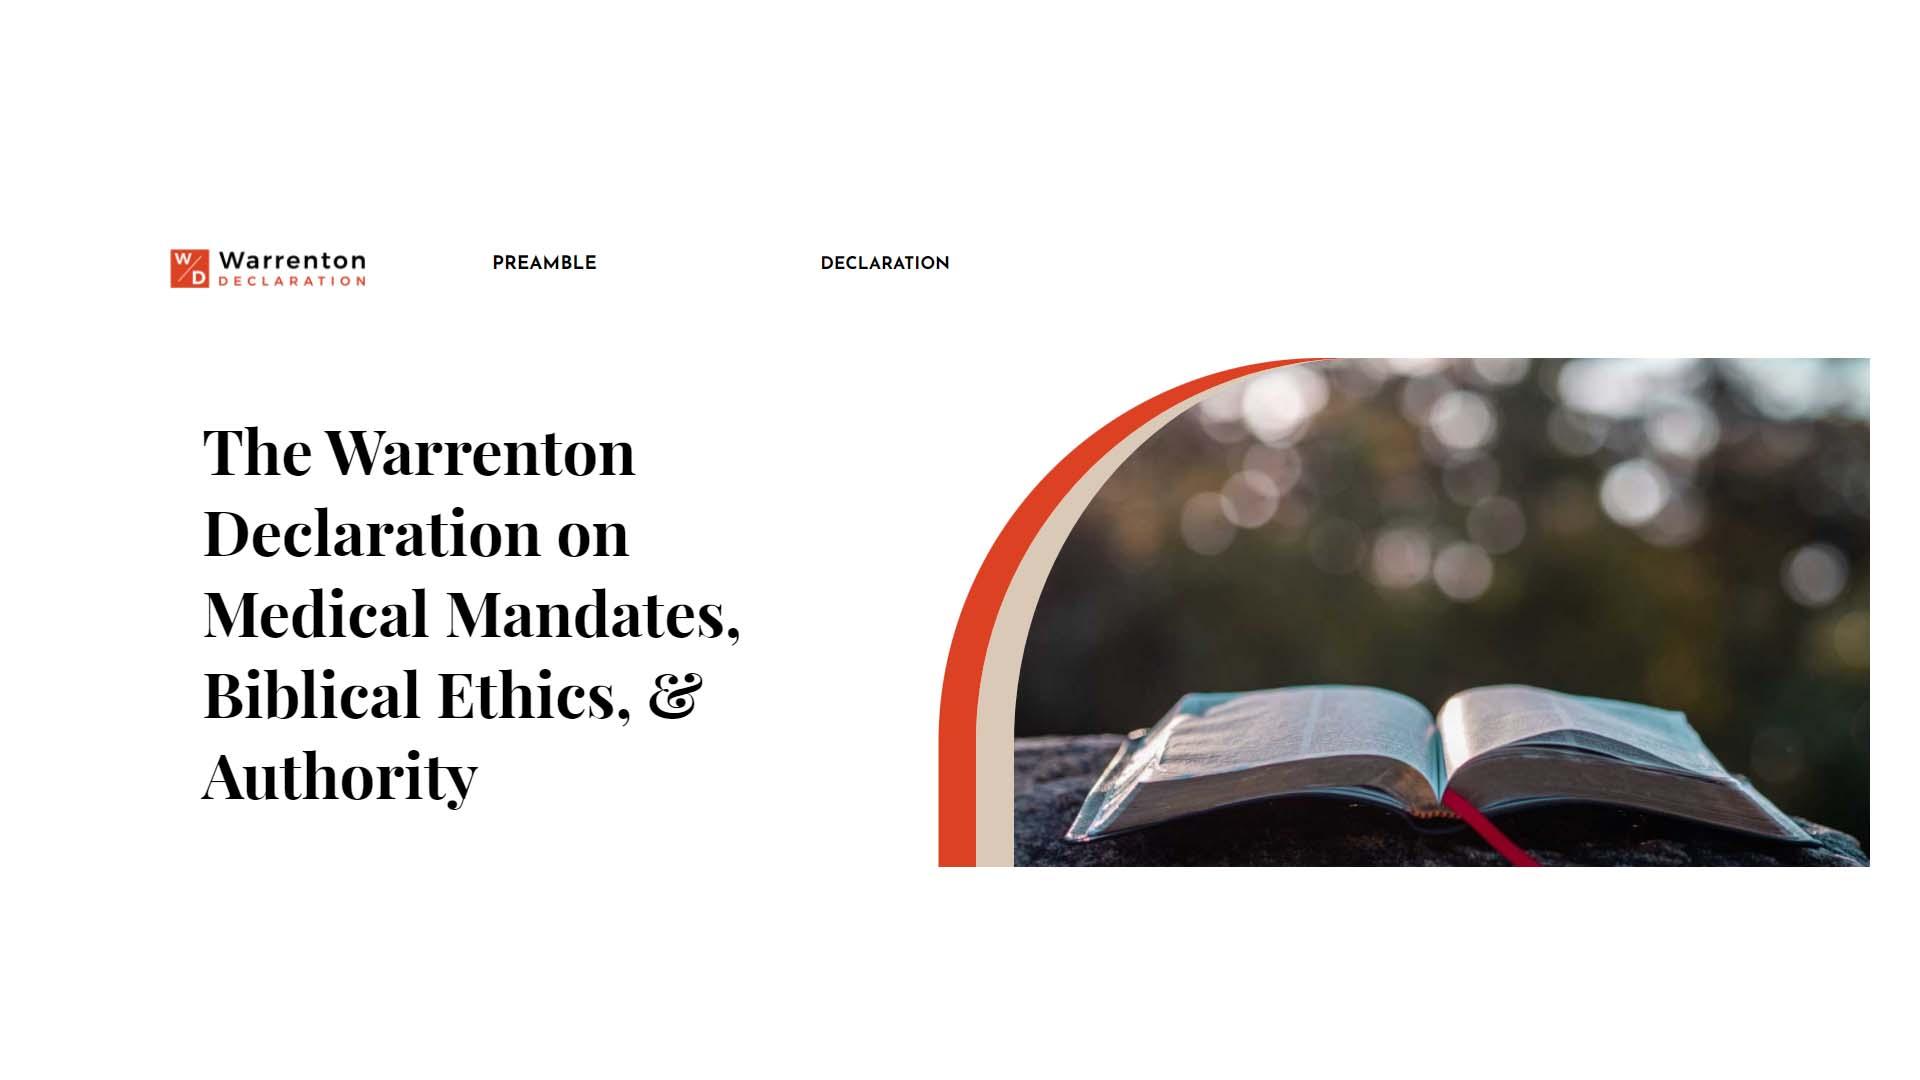 Warrenton Declaration Image